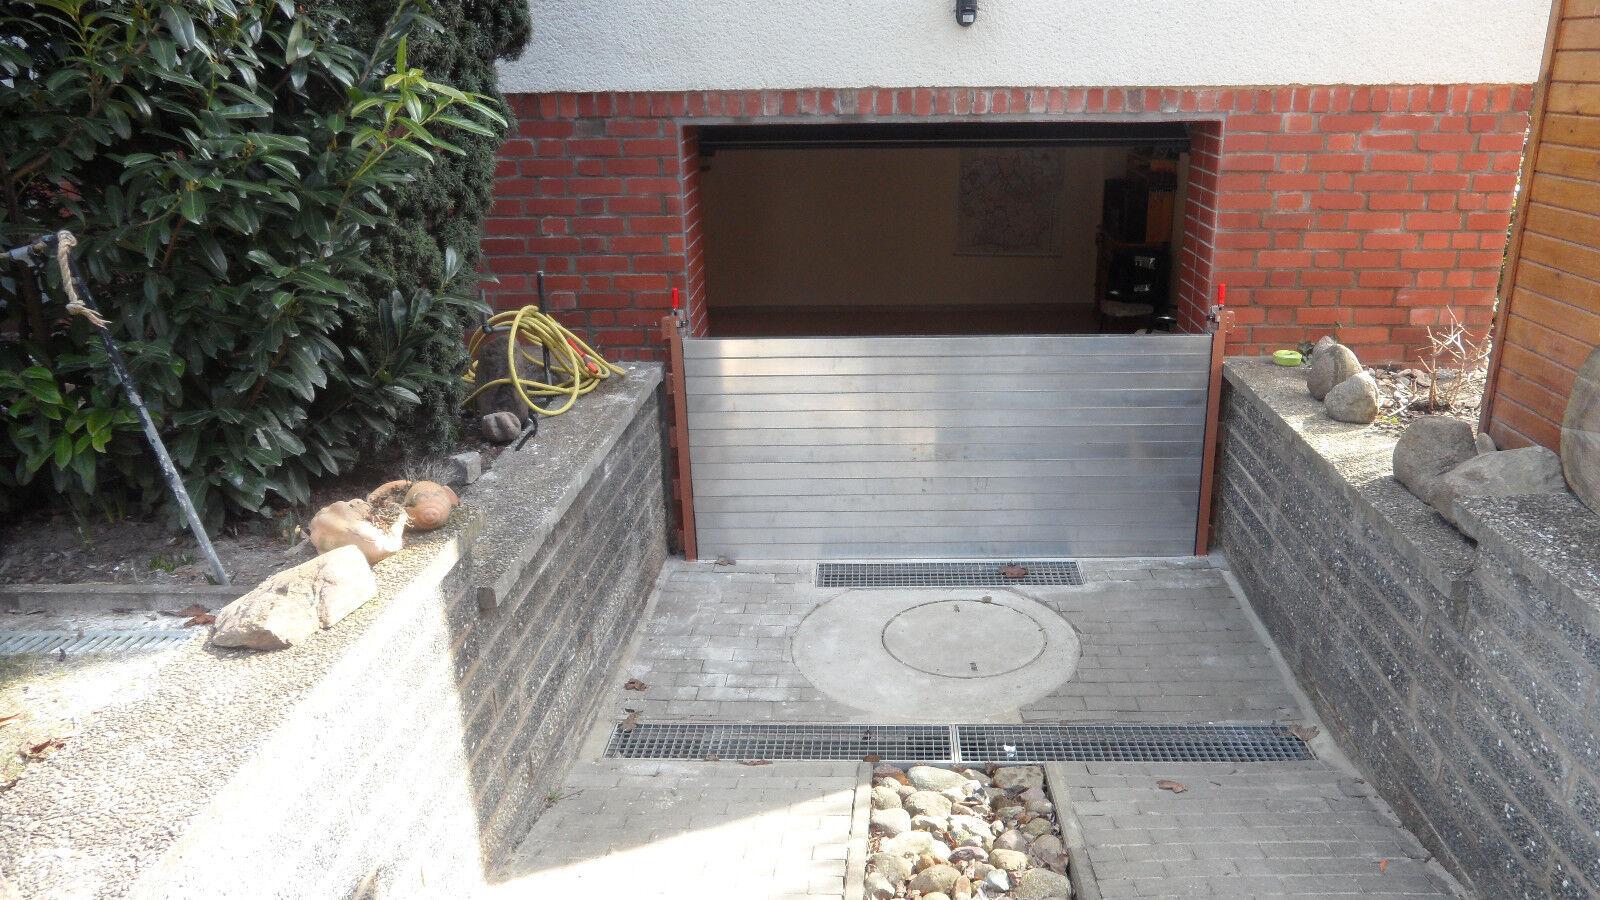 hochwasserschutz aluminium dammbalken mobiles system eur. Black Bedroom Furniture Sets. Home Design Ideas